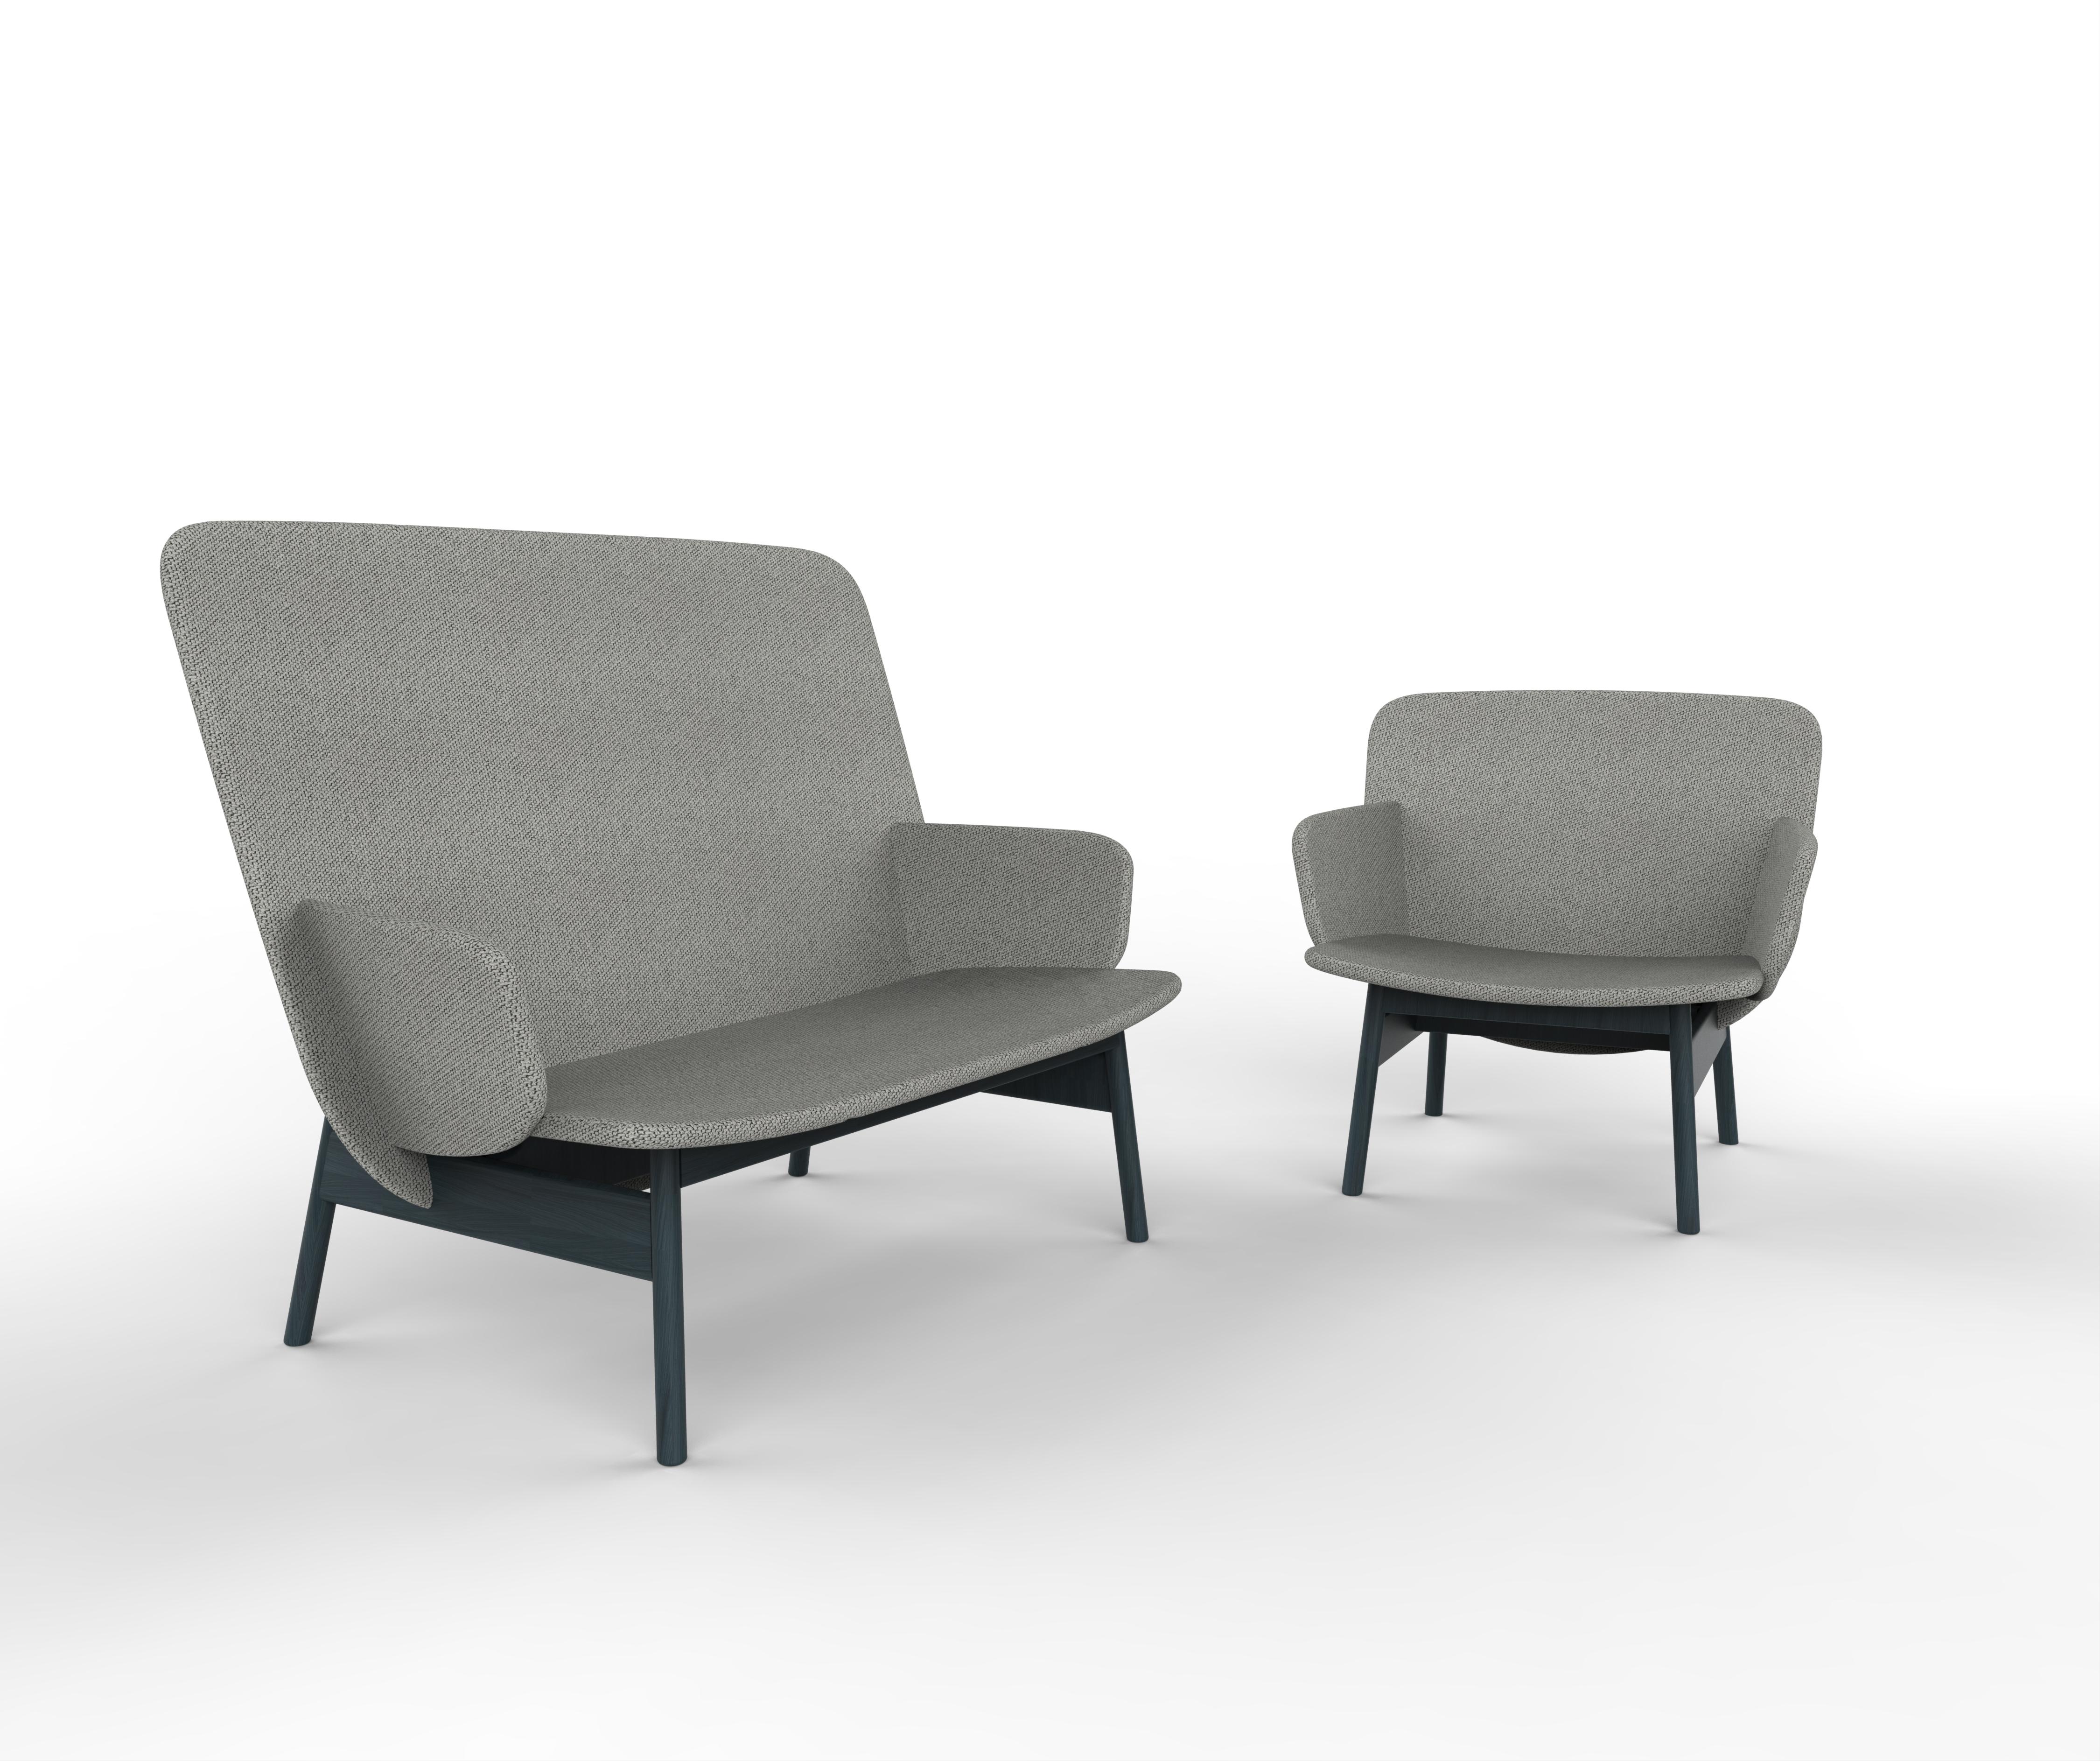 Ala Sofa & Armchair by Sebastian Herkner for La Cividina